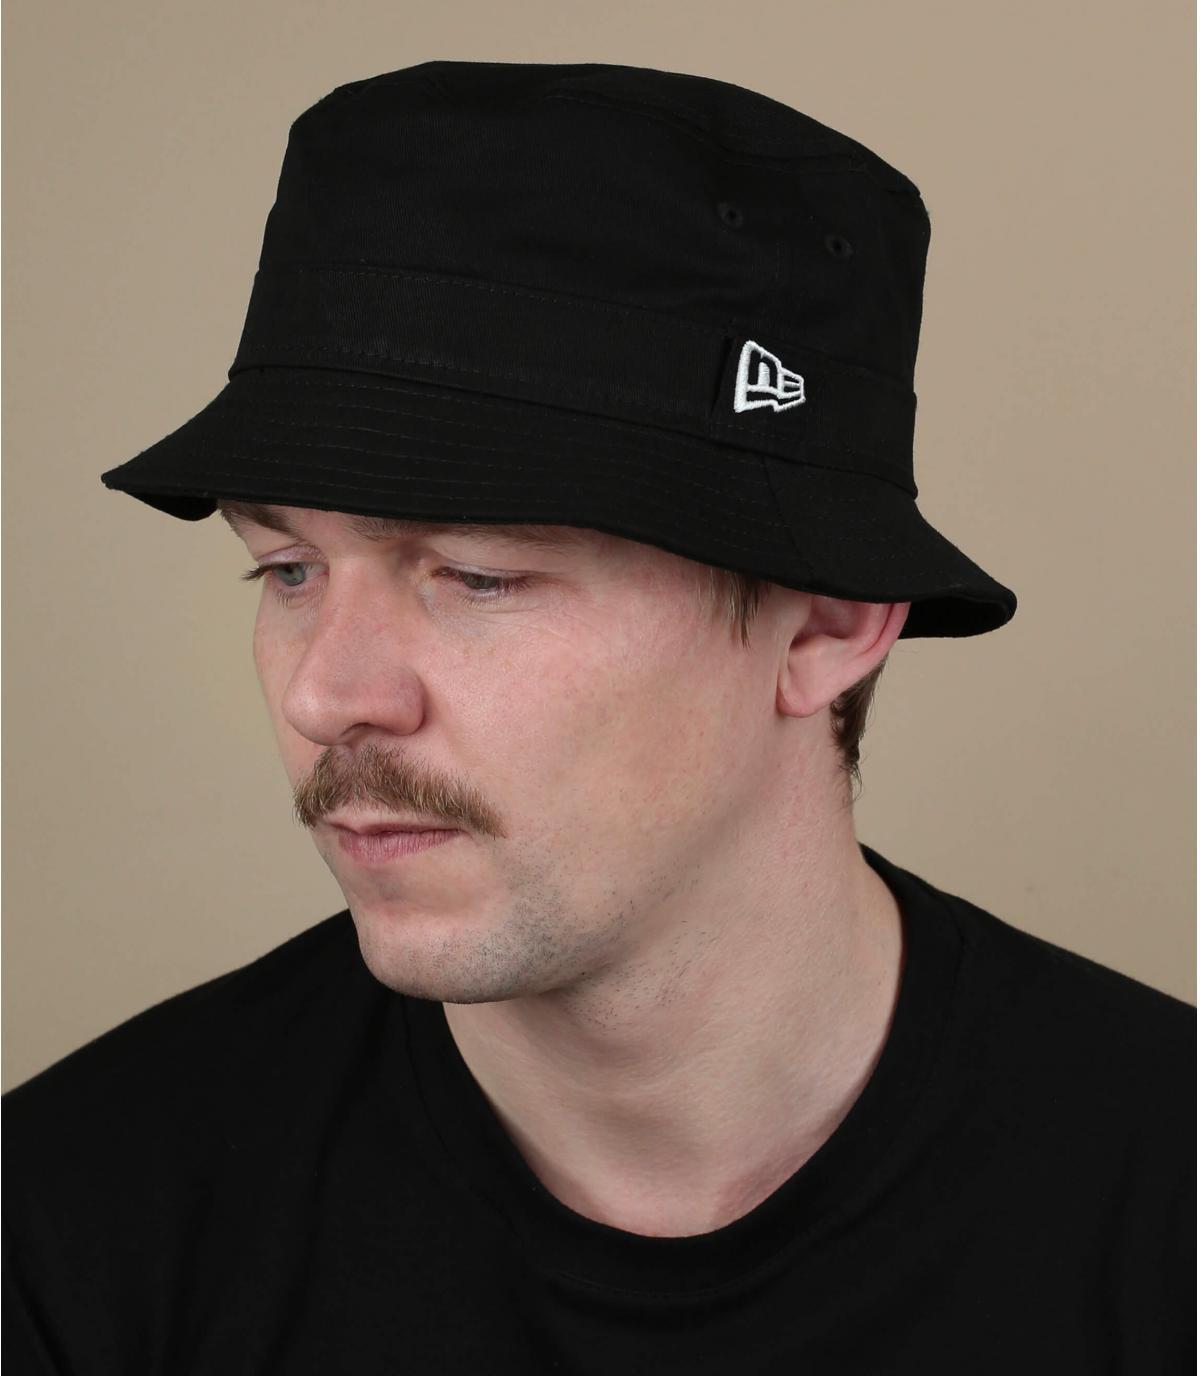 Black New Era bucket hat